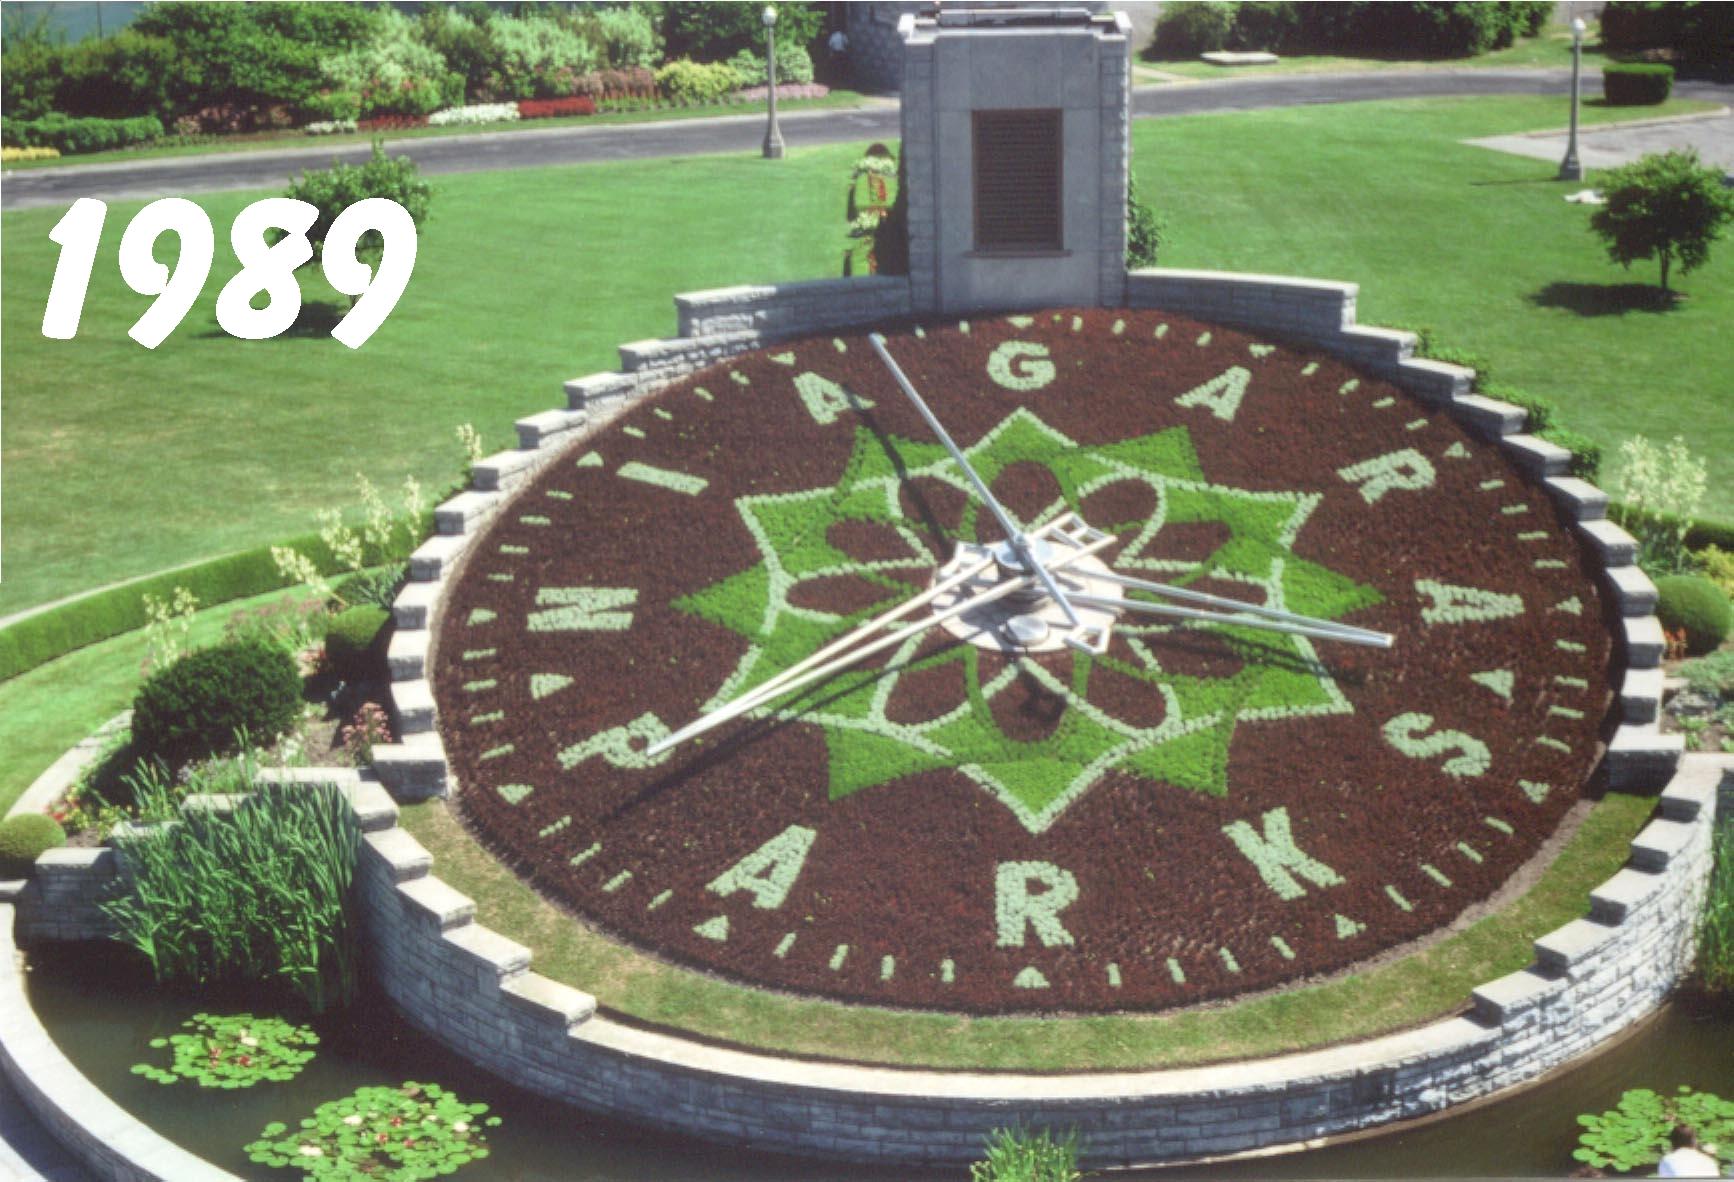 Floral Clock, 1989